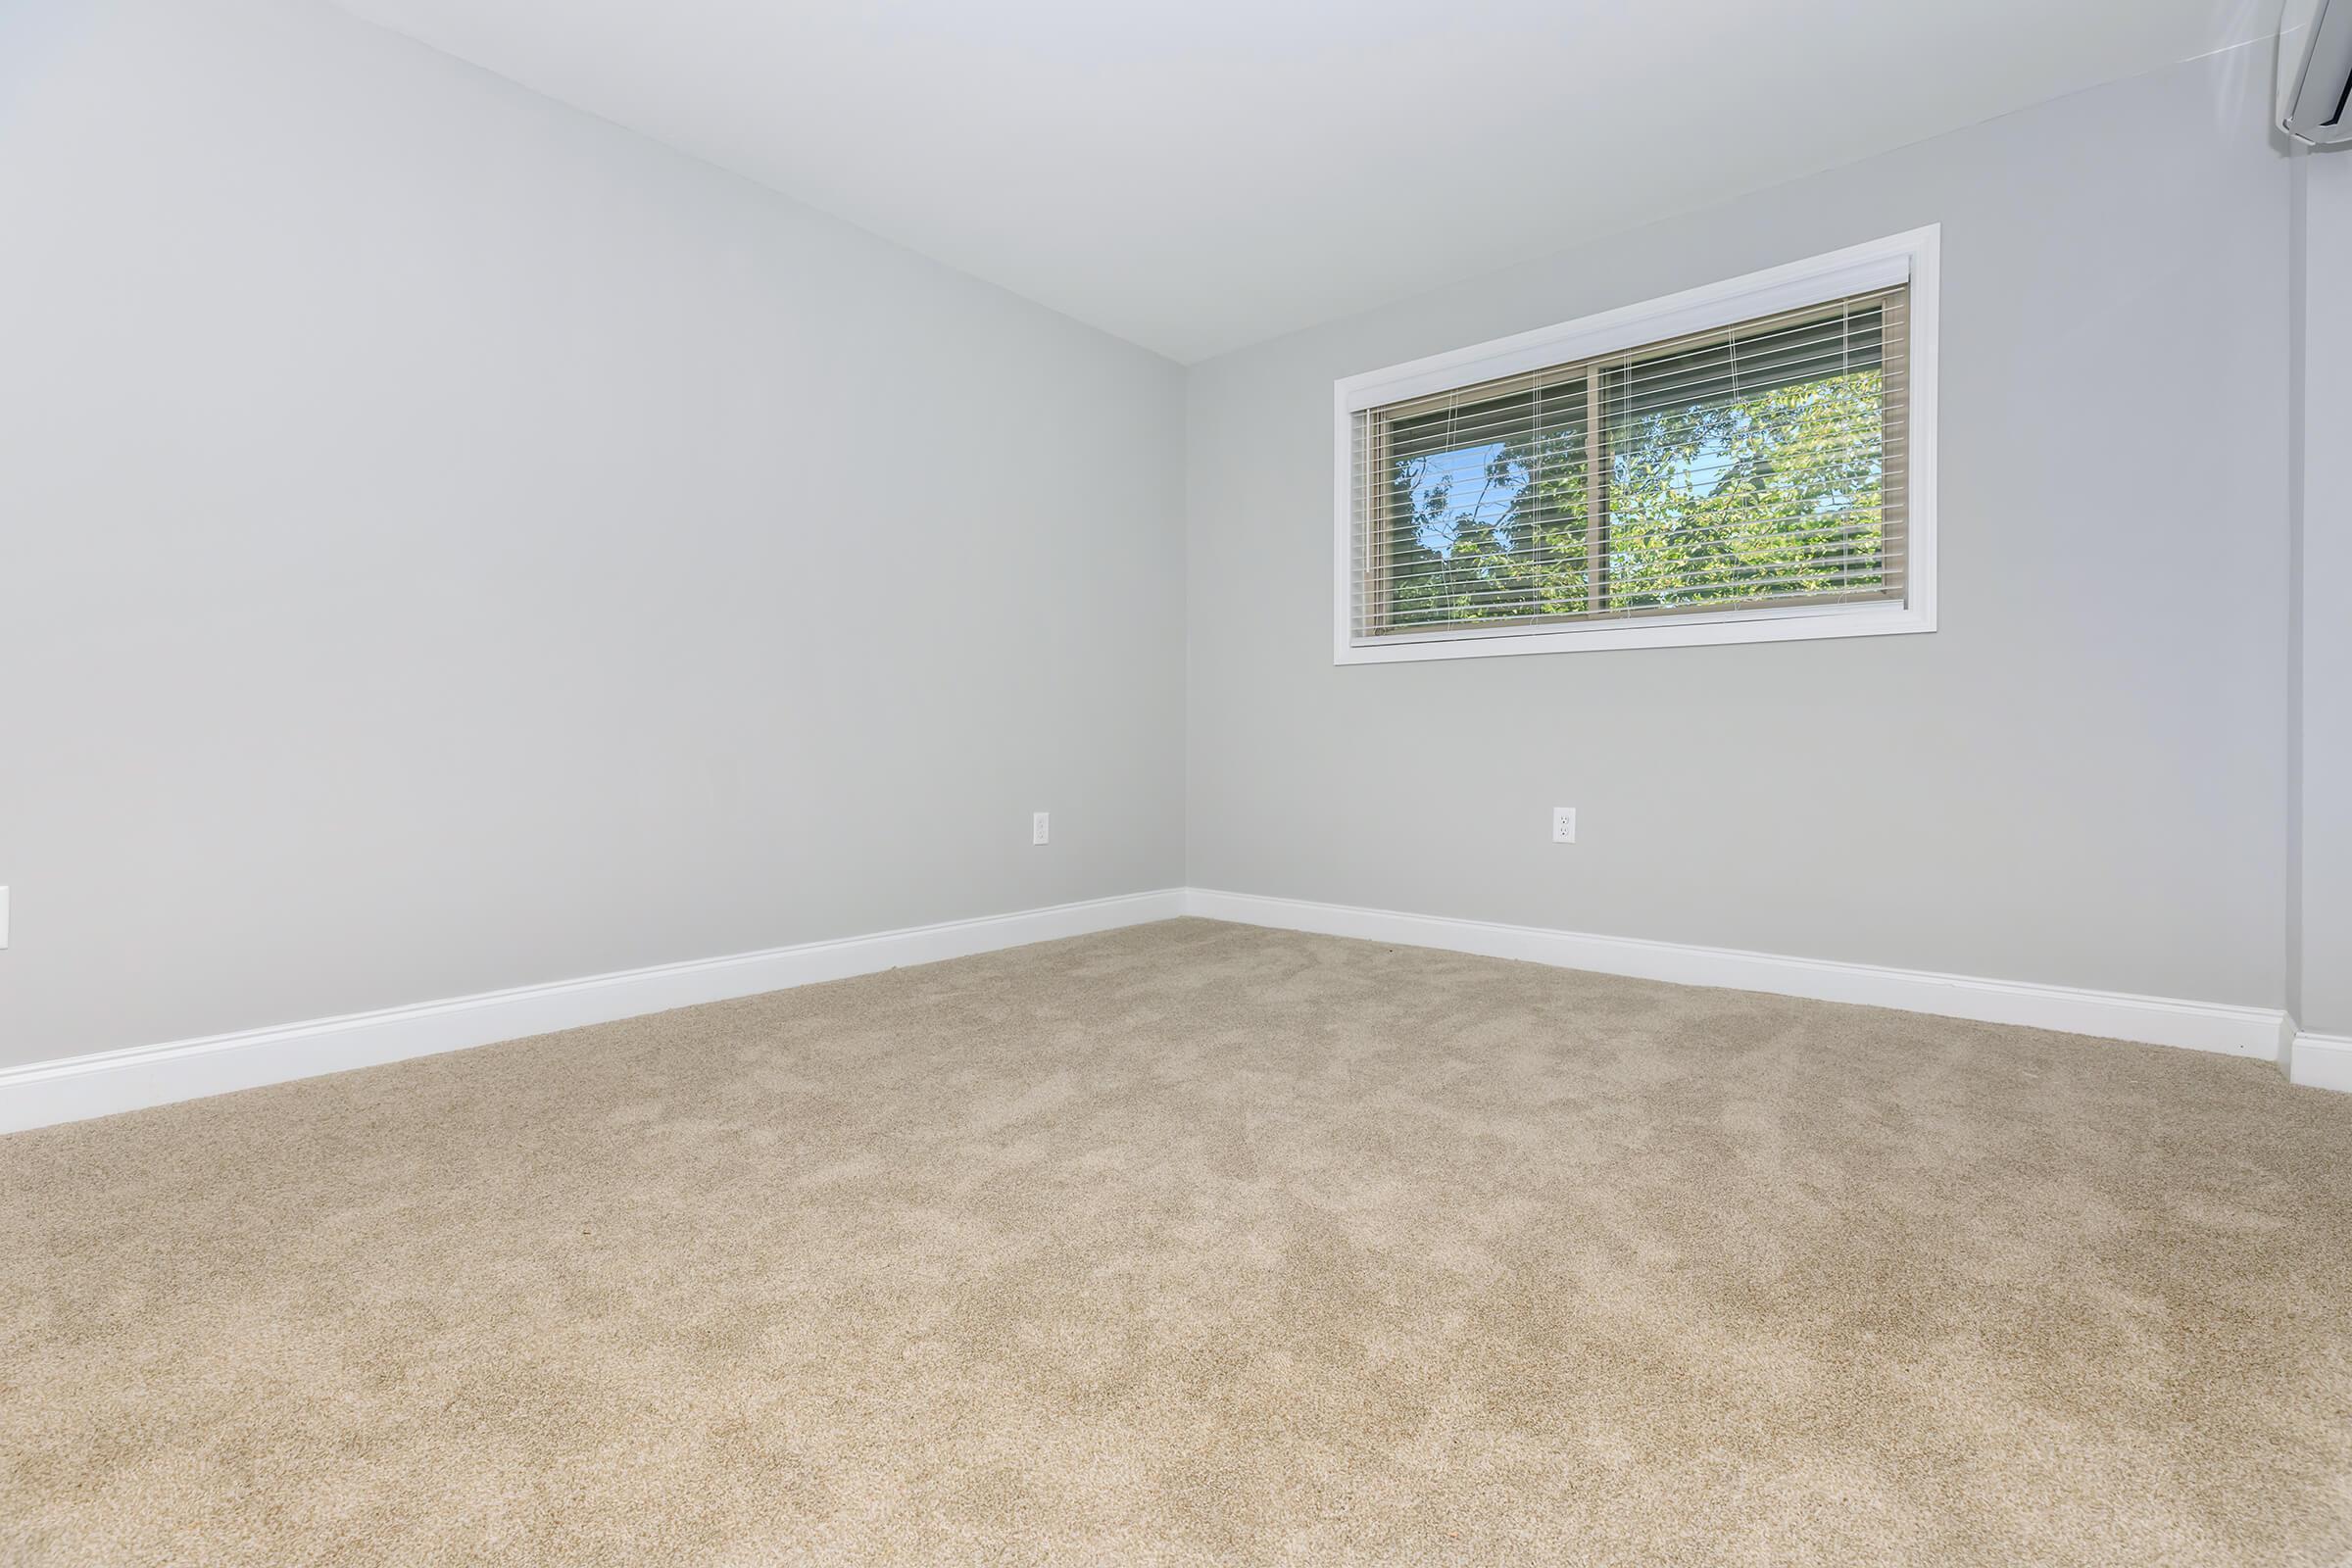 Room at The Allante Apartments in Alexandria, VA